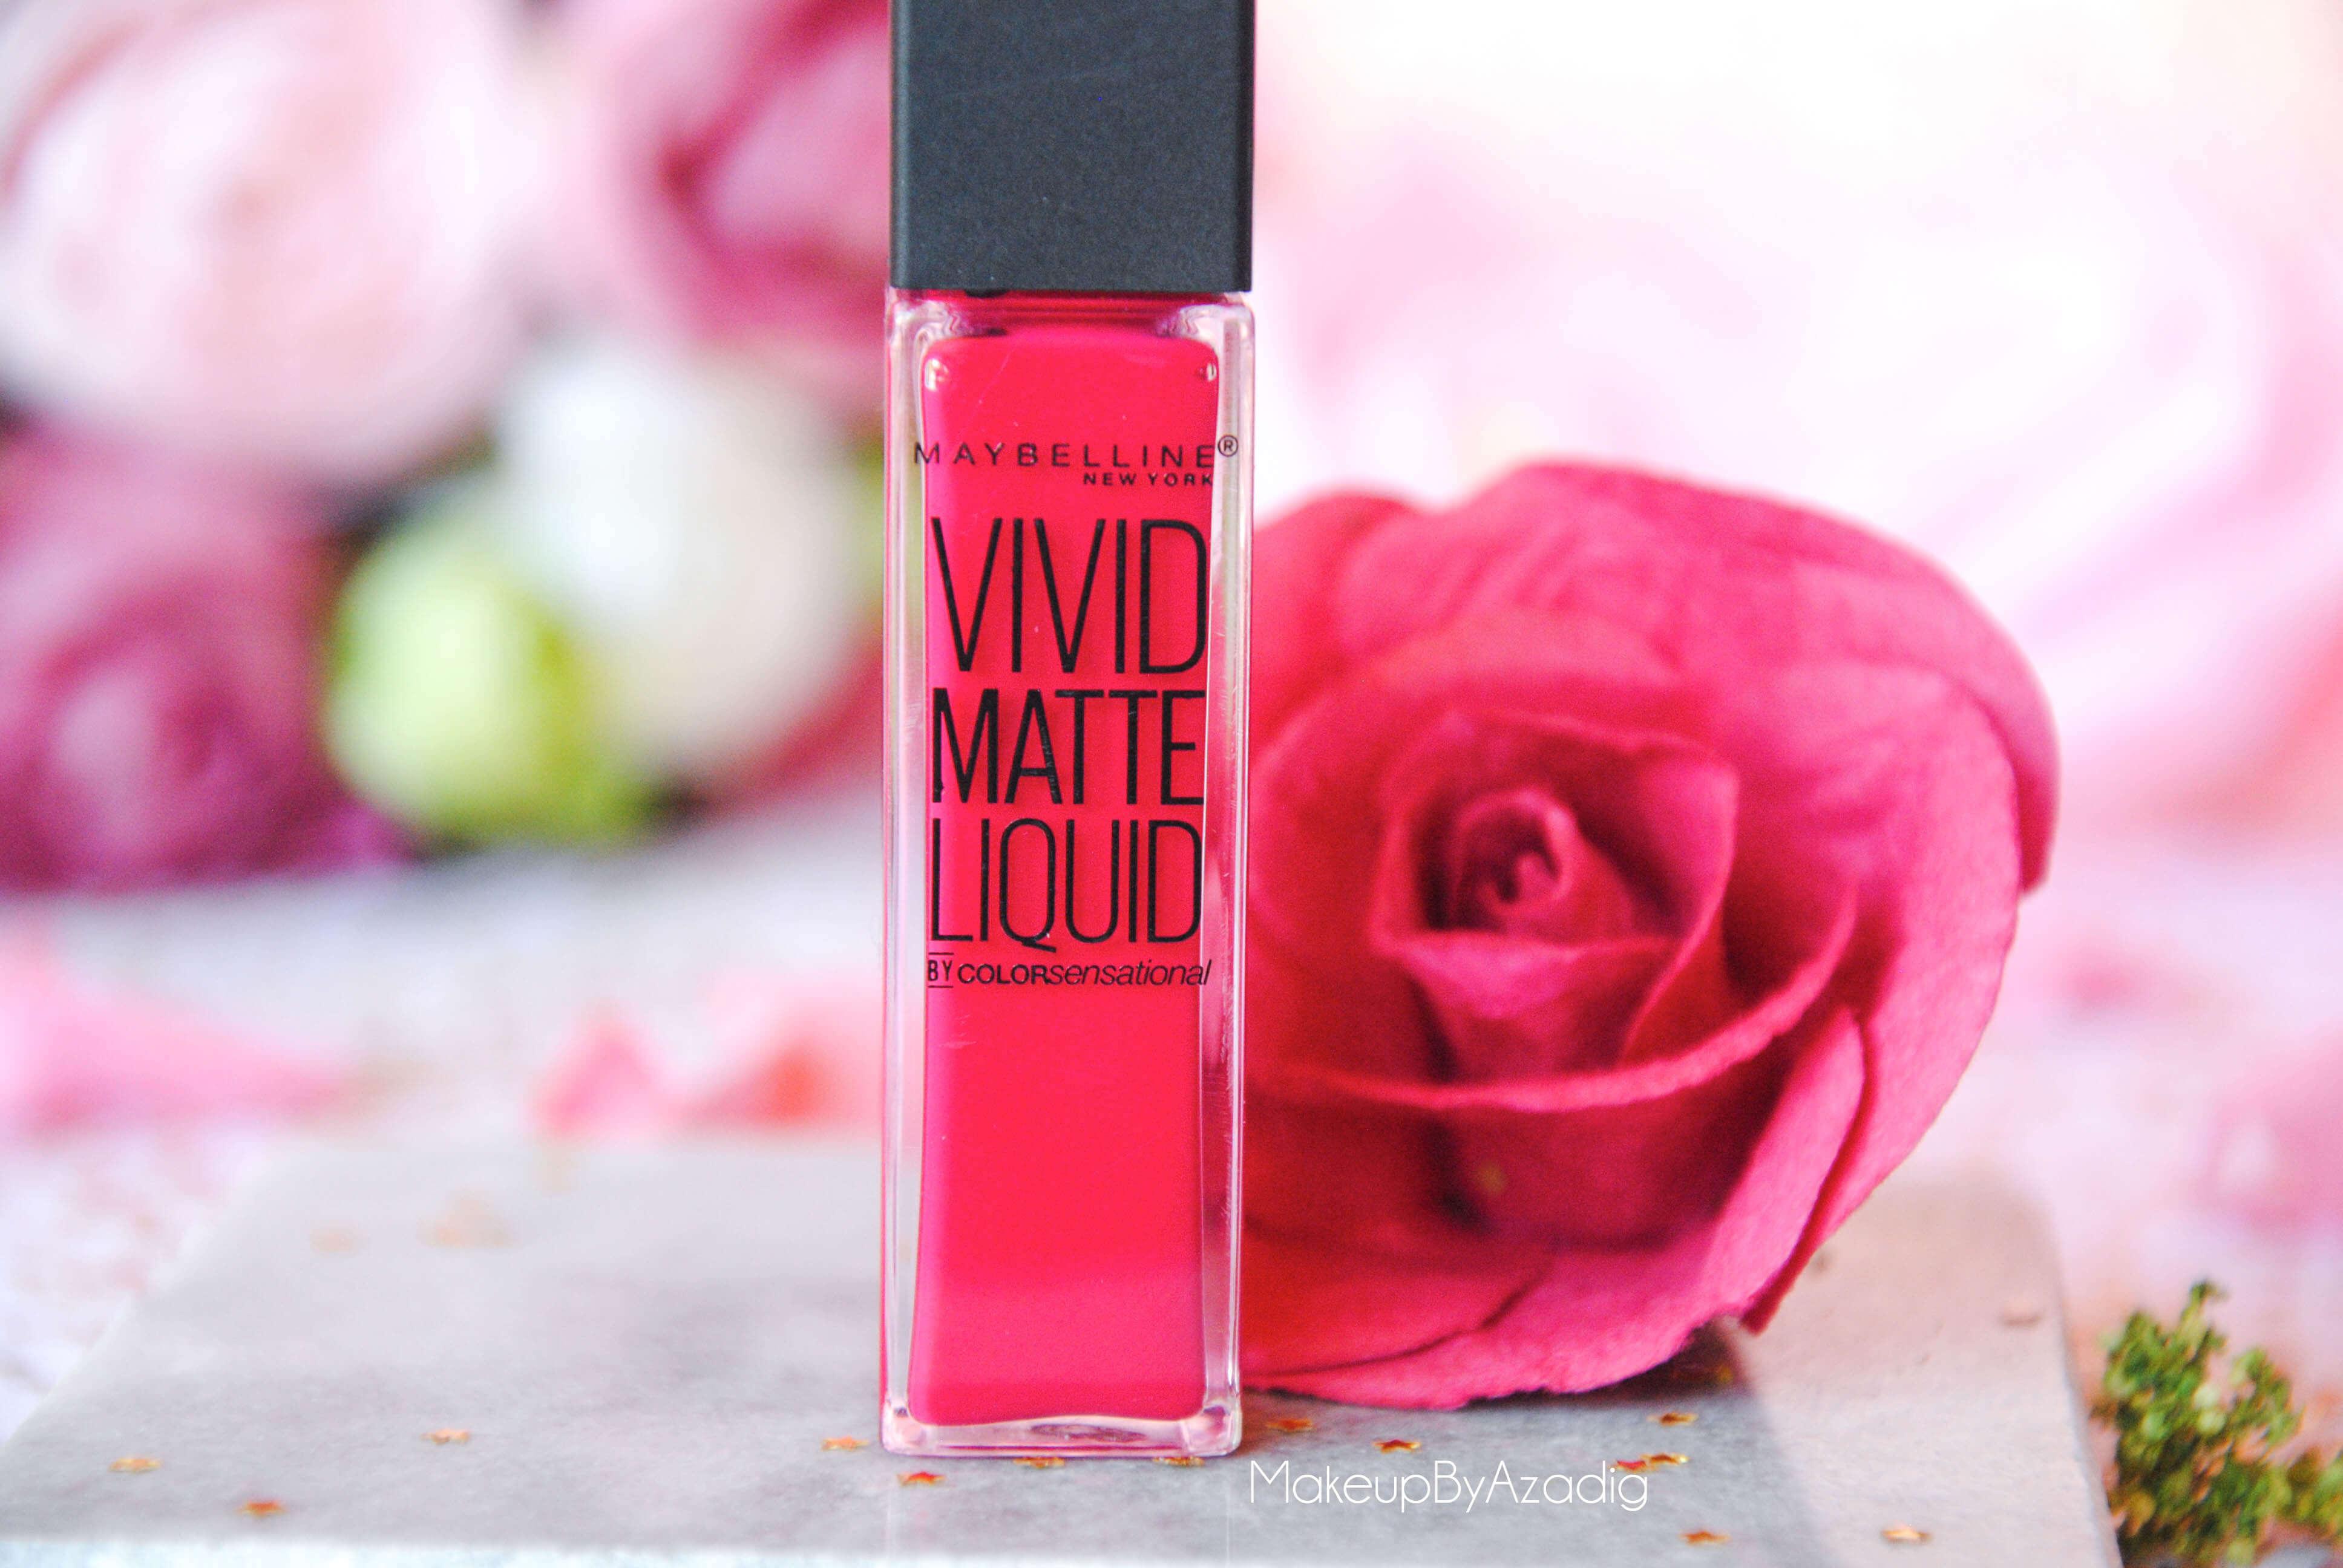 makeupbyazadig-troyes-gemey-maybelline-new-york-nude-flush-orange-shot-possessed-plum-berry-boost-fuchsia-ecstasy-corail-courage-vivid-matte-liquid-by-colorsensational-lips